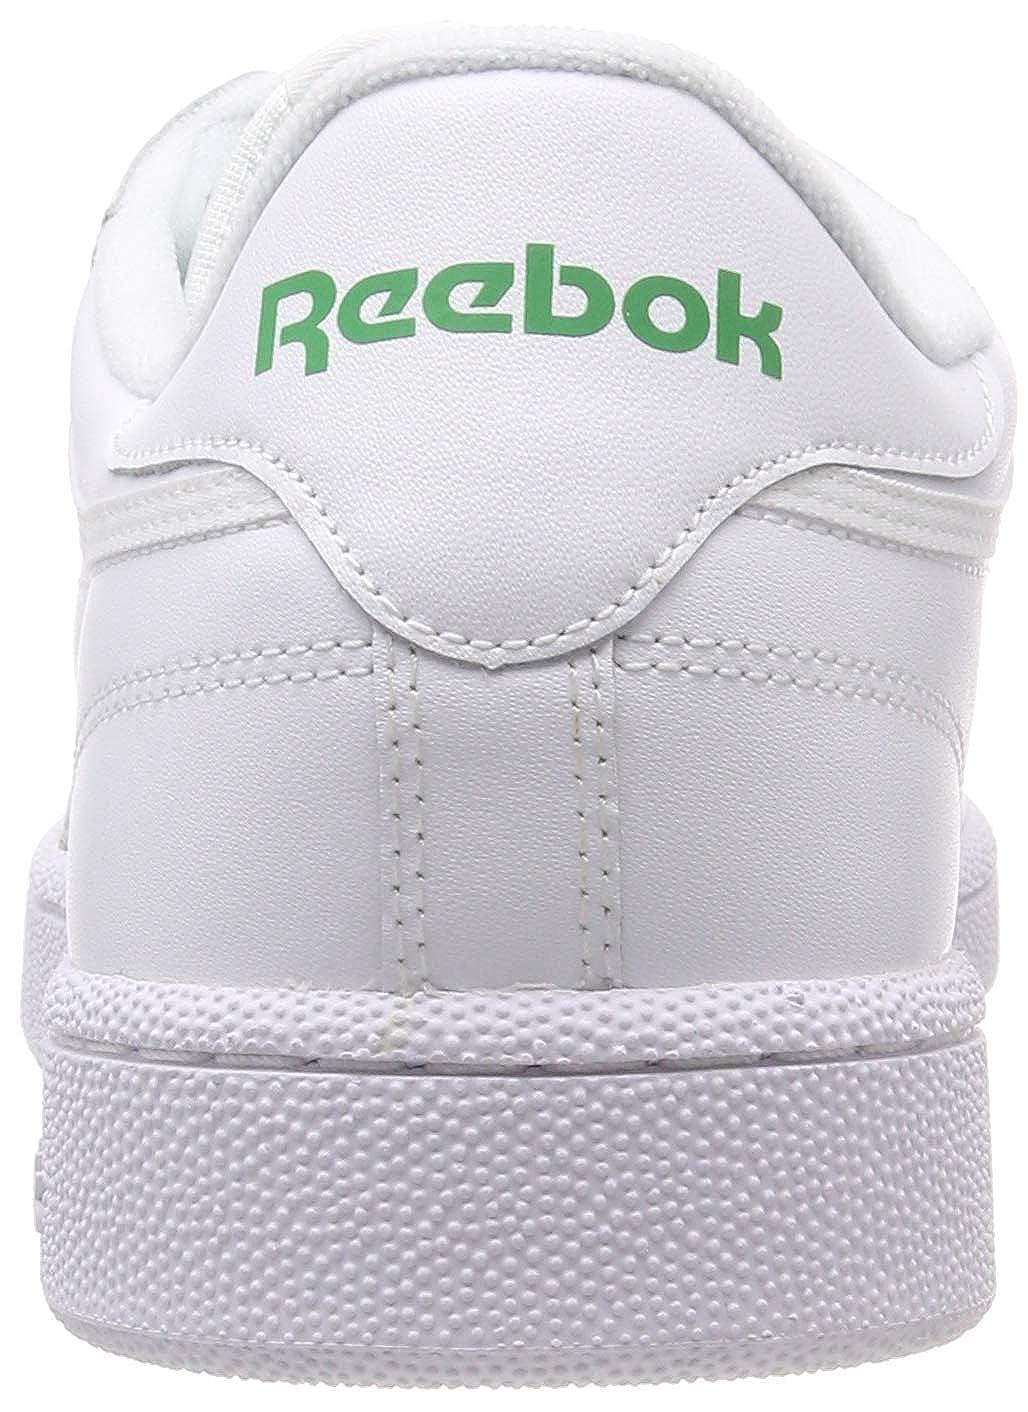 397dce7207e56 Reebok Men s s Club C 85 Trainers  Amazon.co.uk  Shoes   Bags